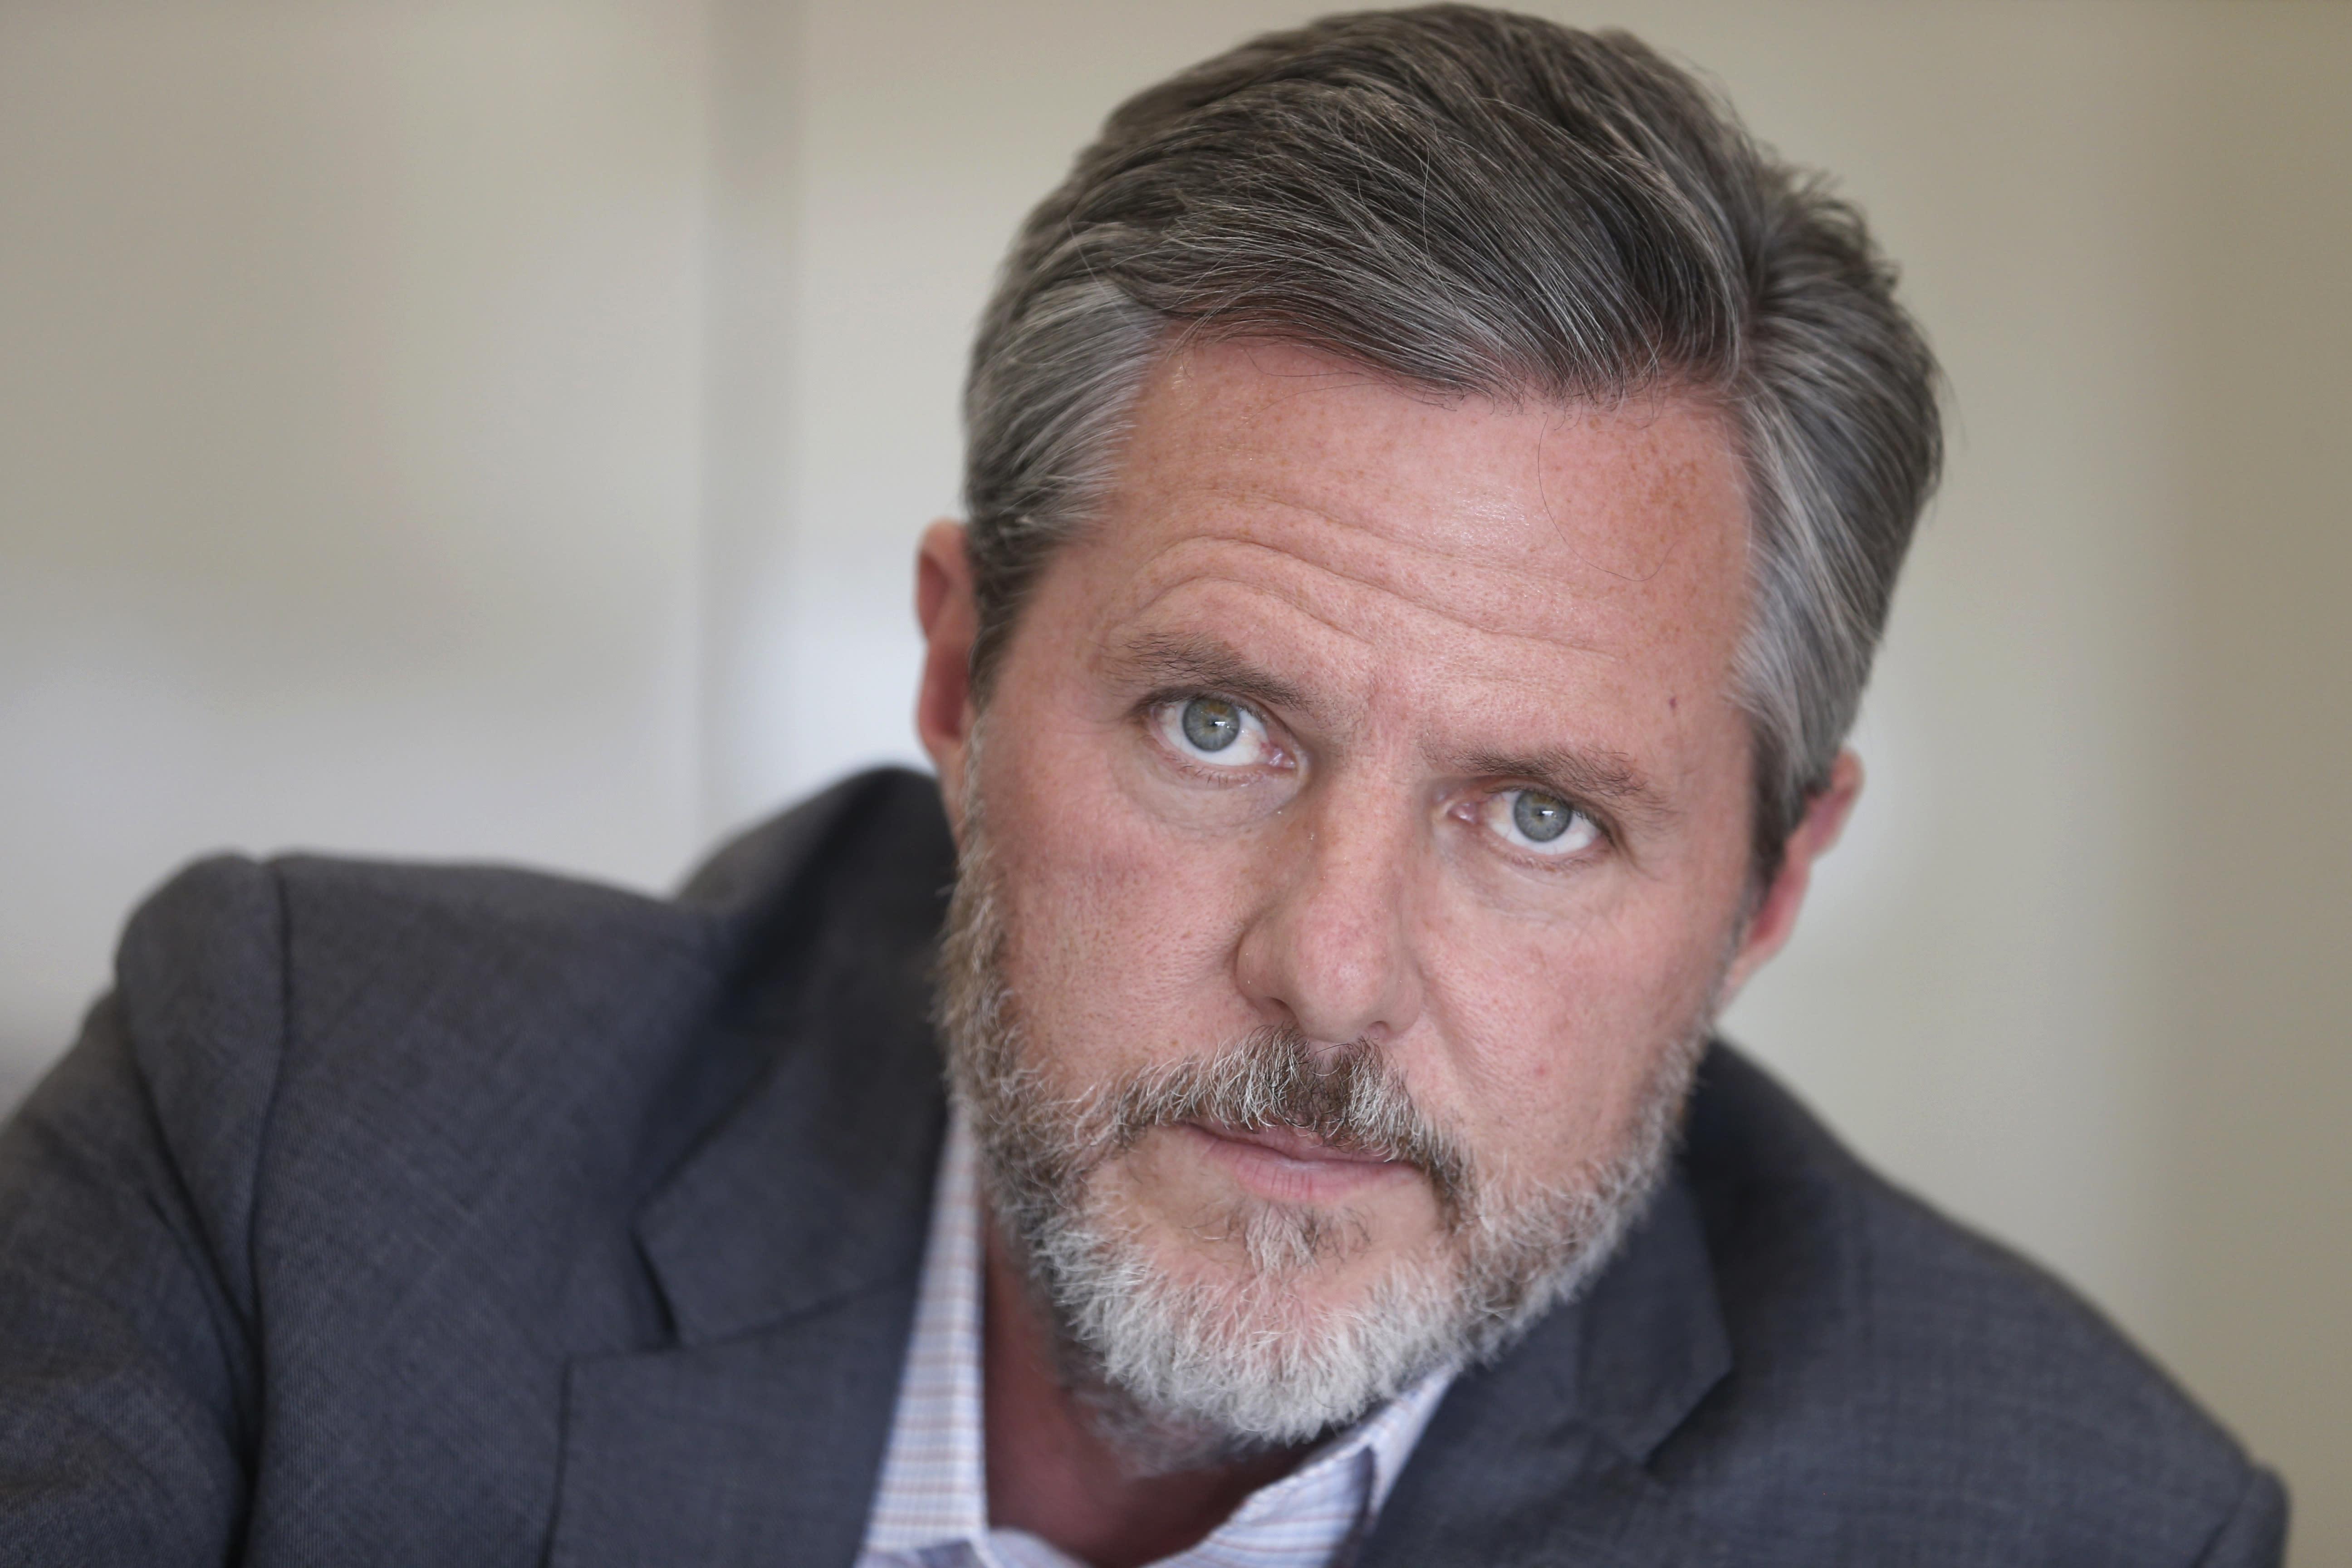 Falwell sues Liberty over damaged reputation